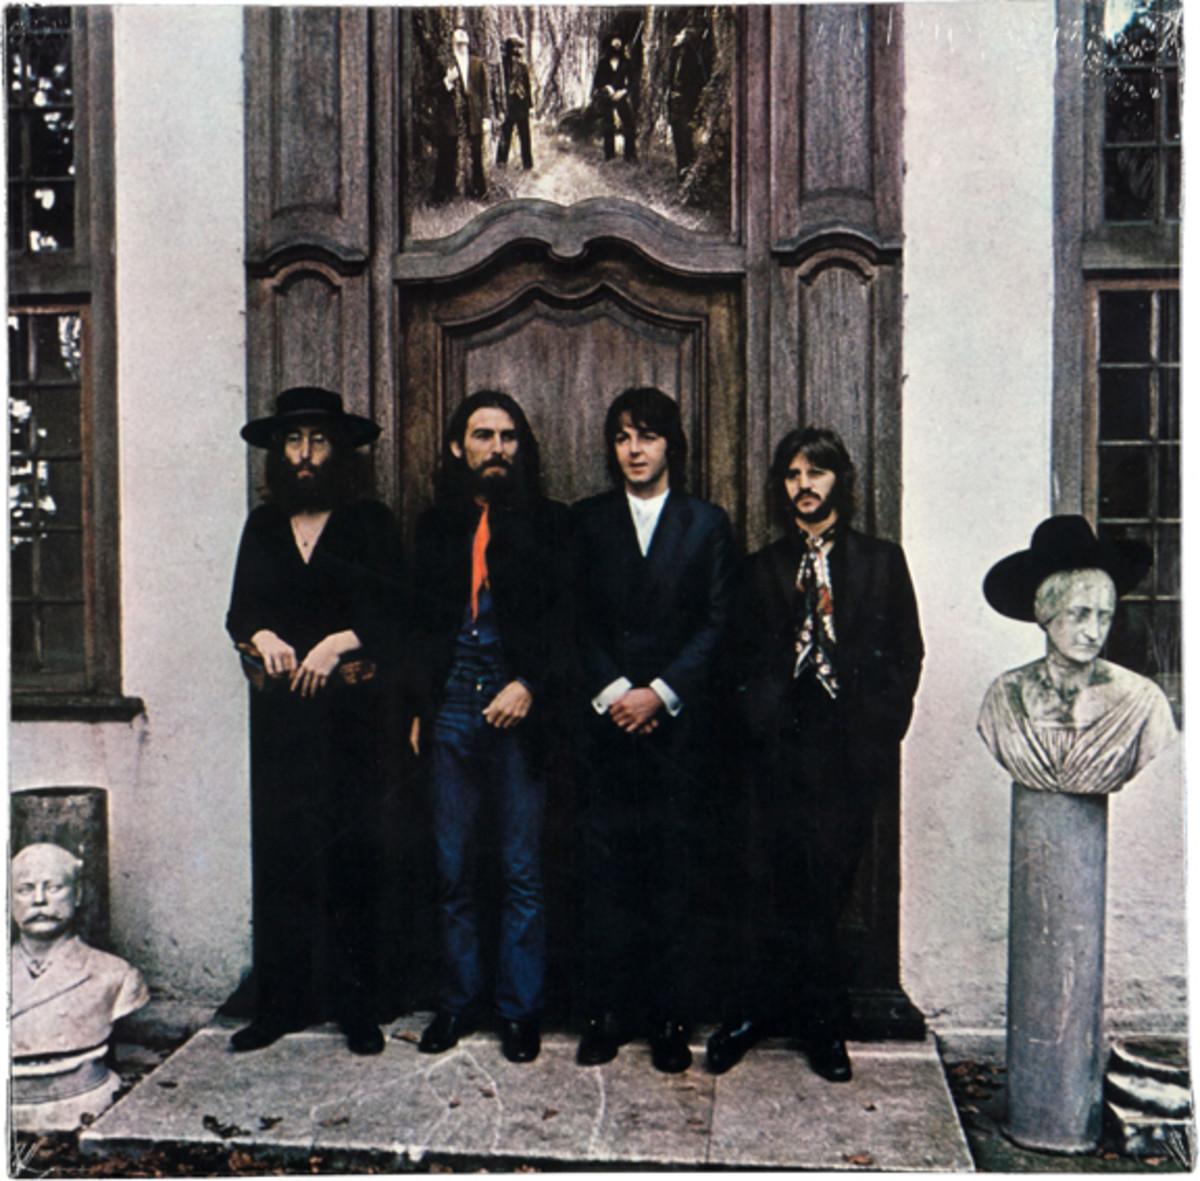 Beatles Hey Jude record